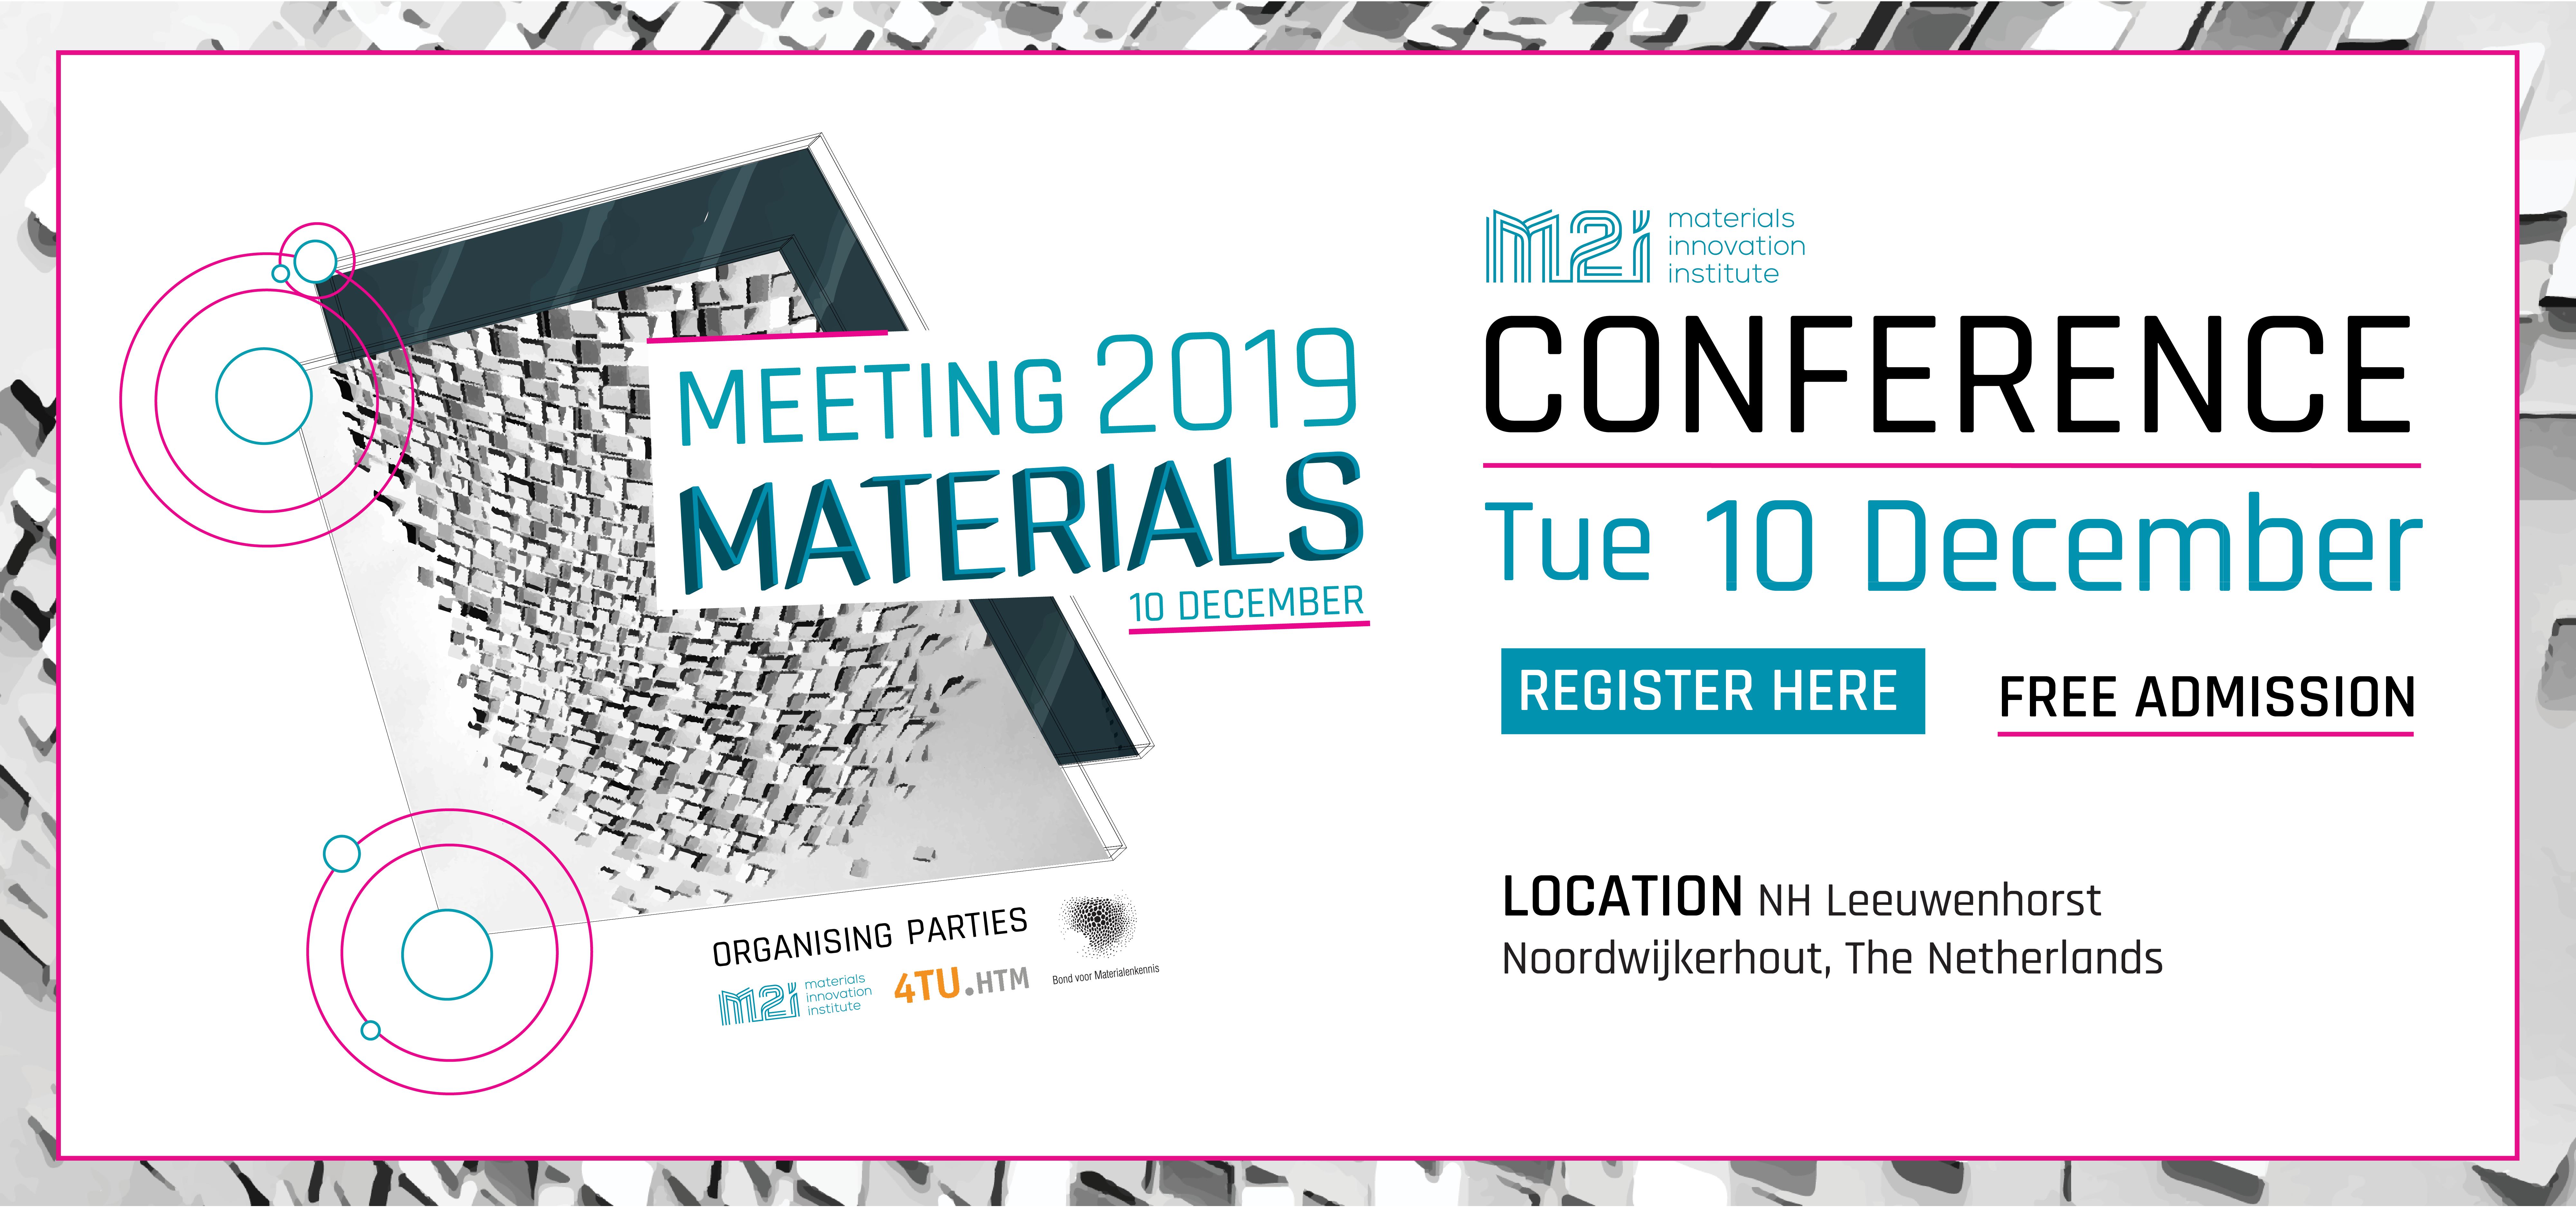 Meeting Materials 2019